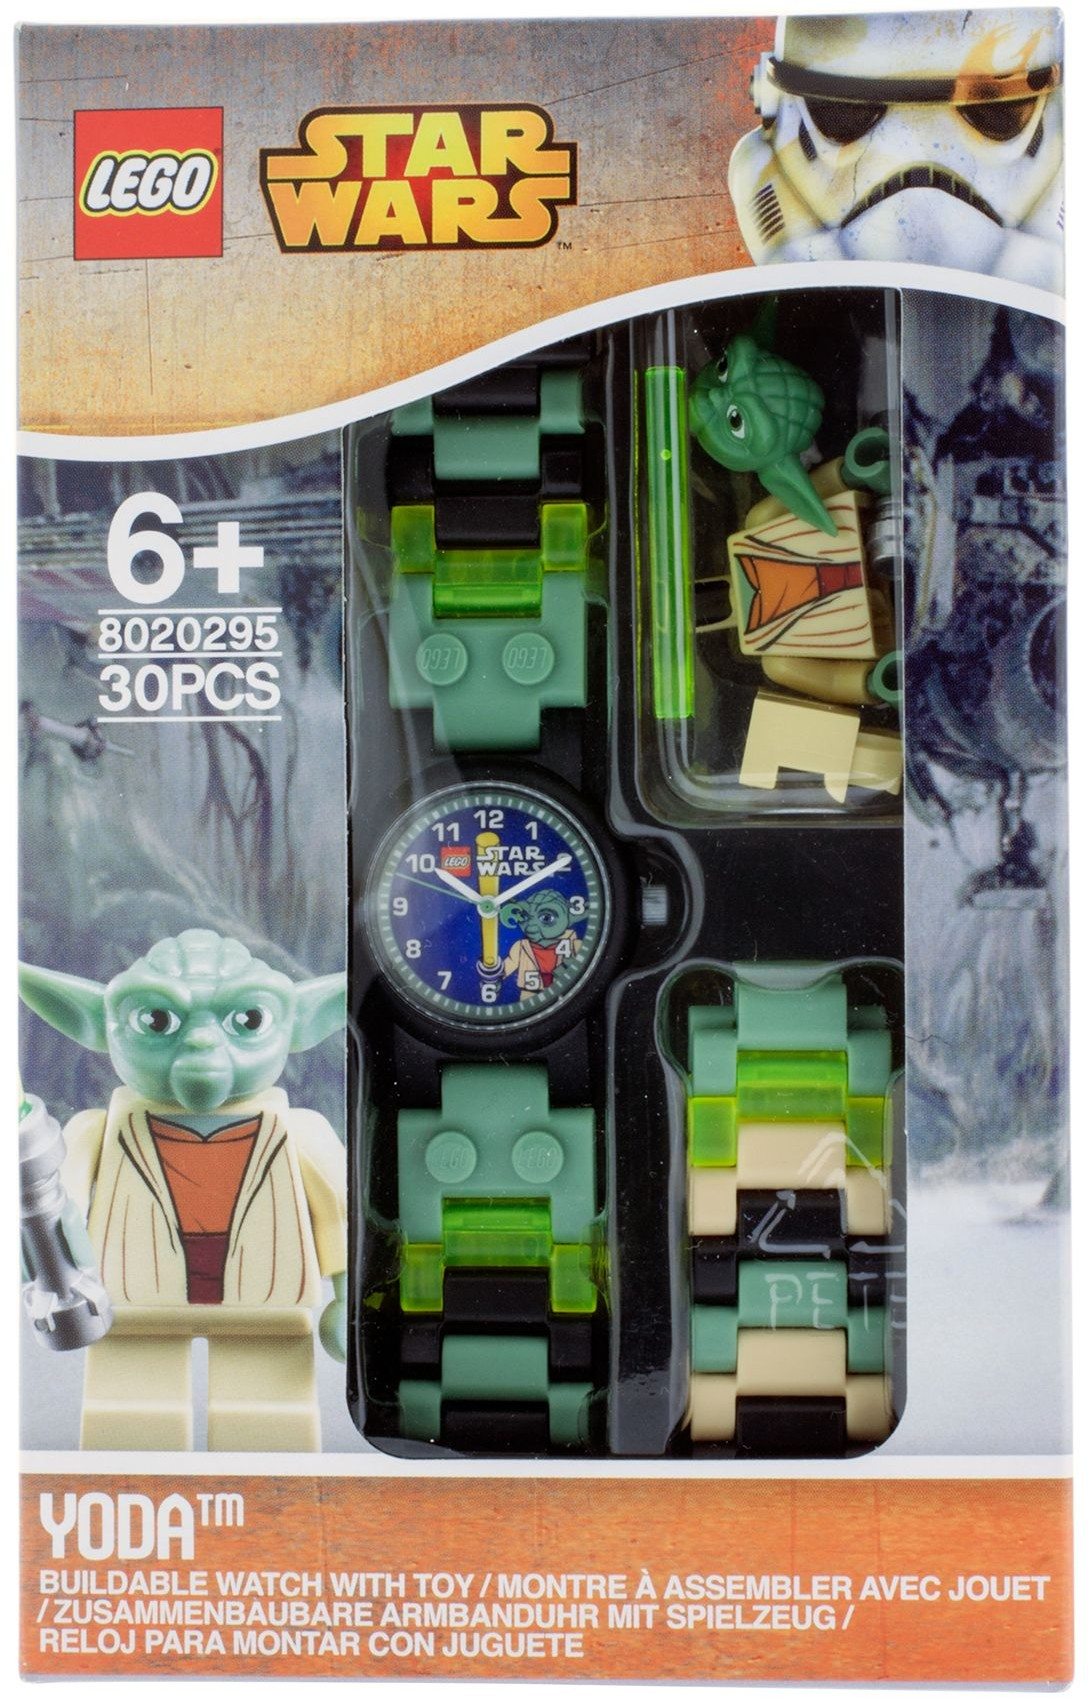 5004610 Yoda Watch